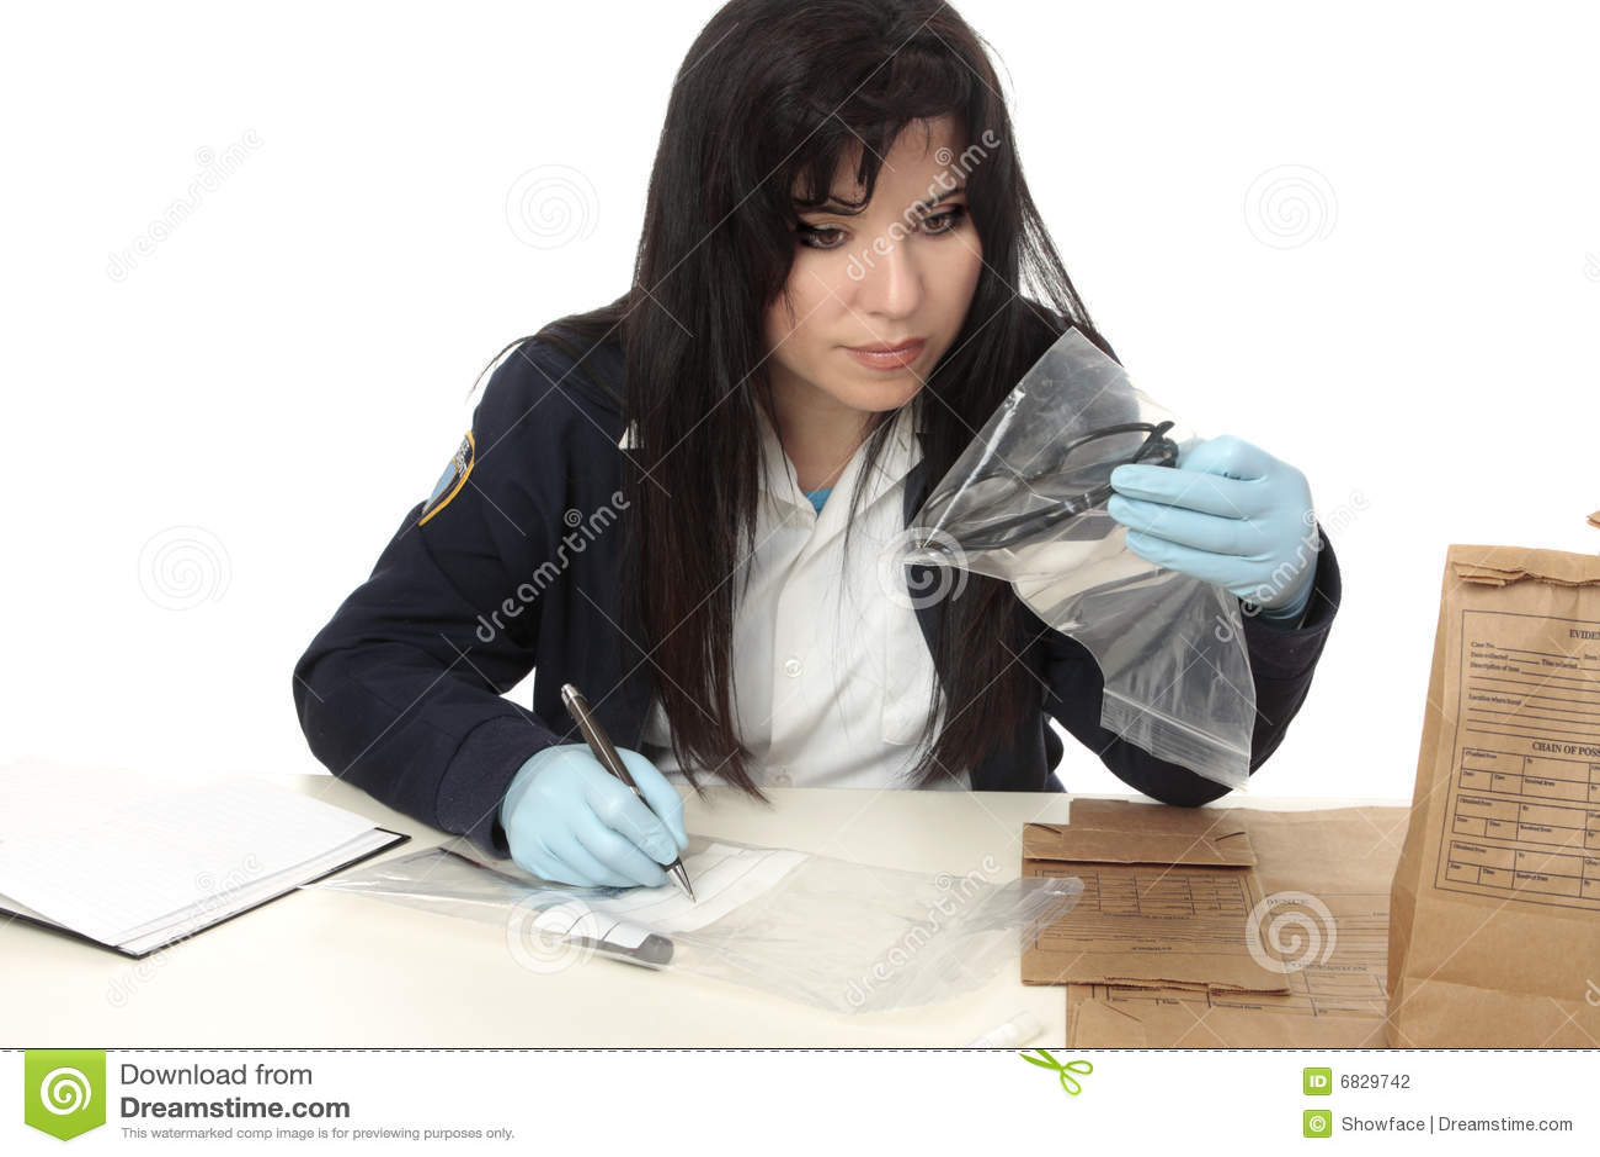 CSI documenting evidence